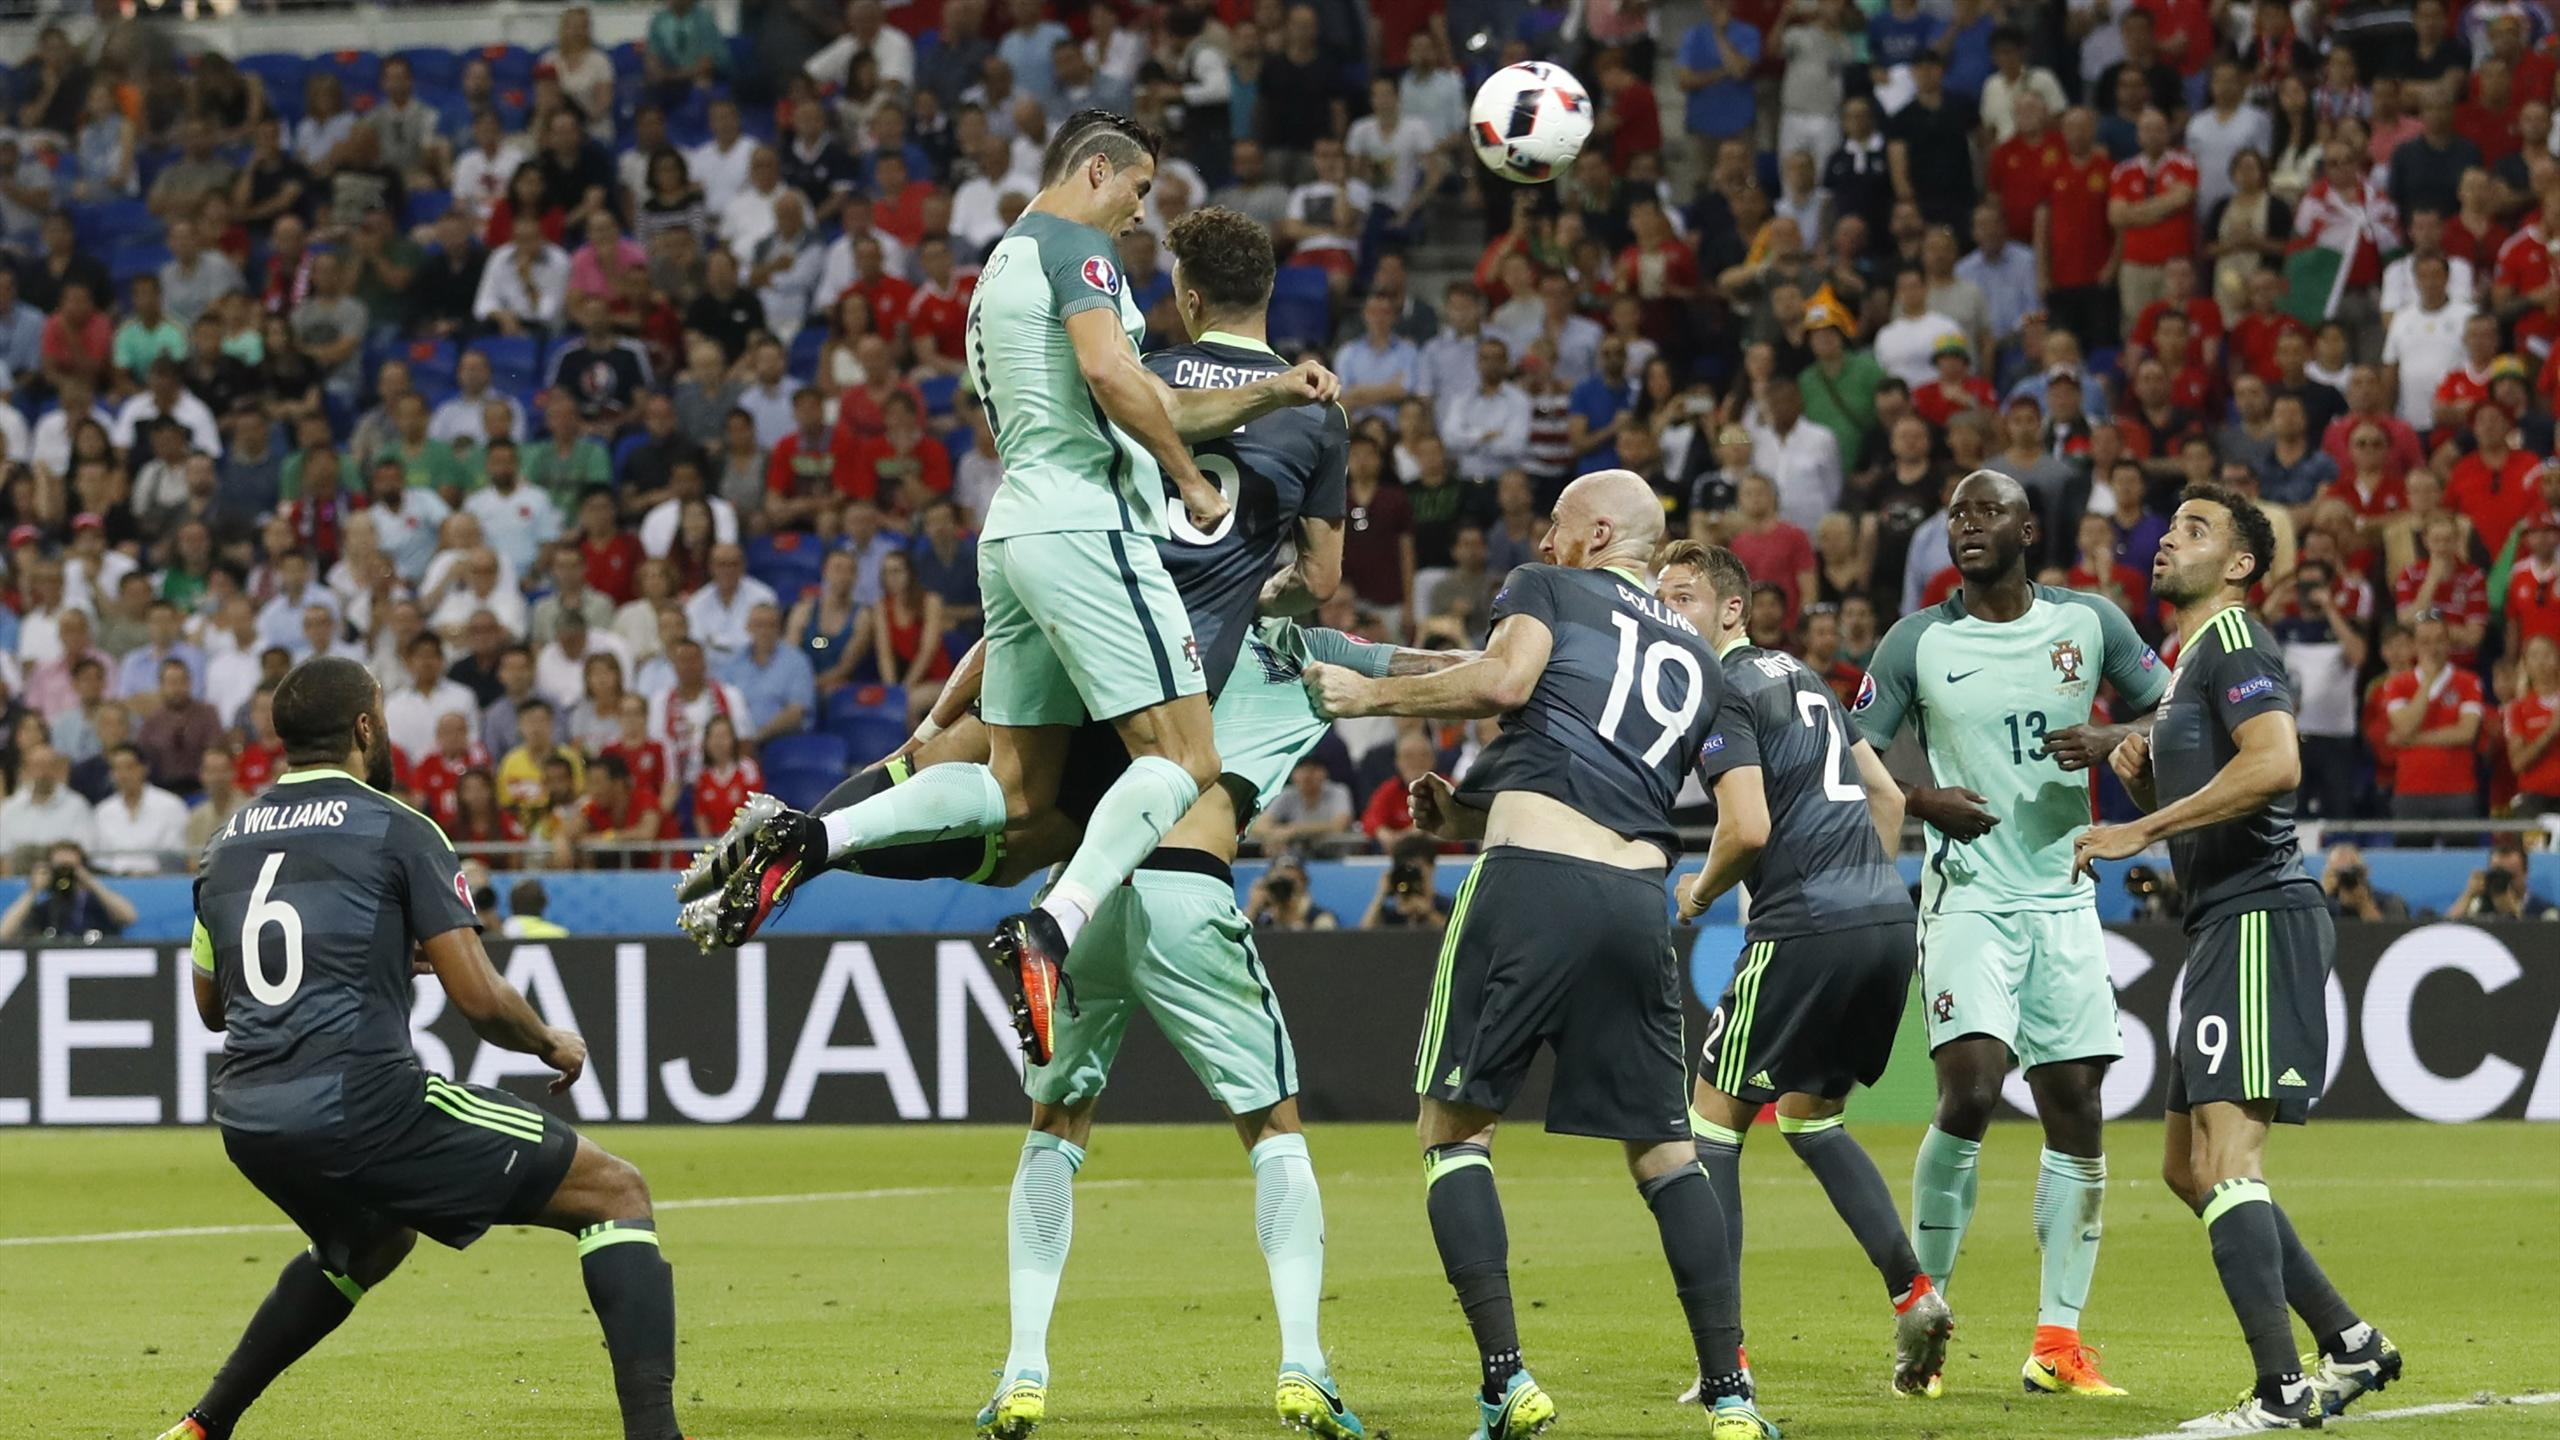 Portugal's Cristiano Ronaldo scores against Wales